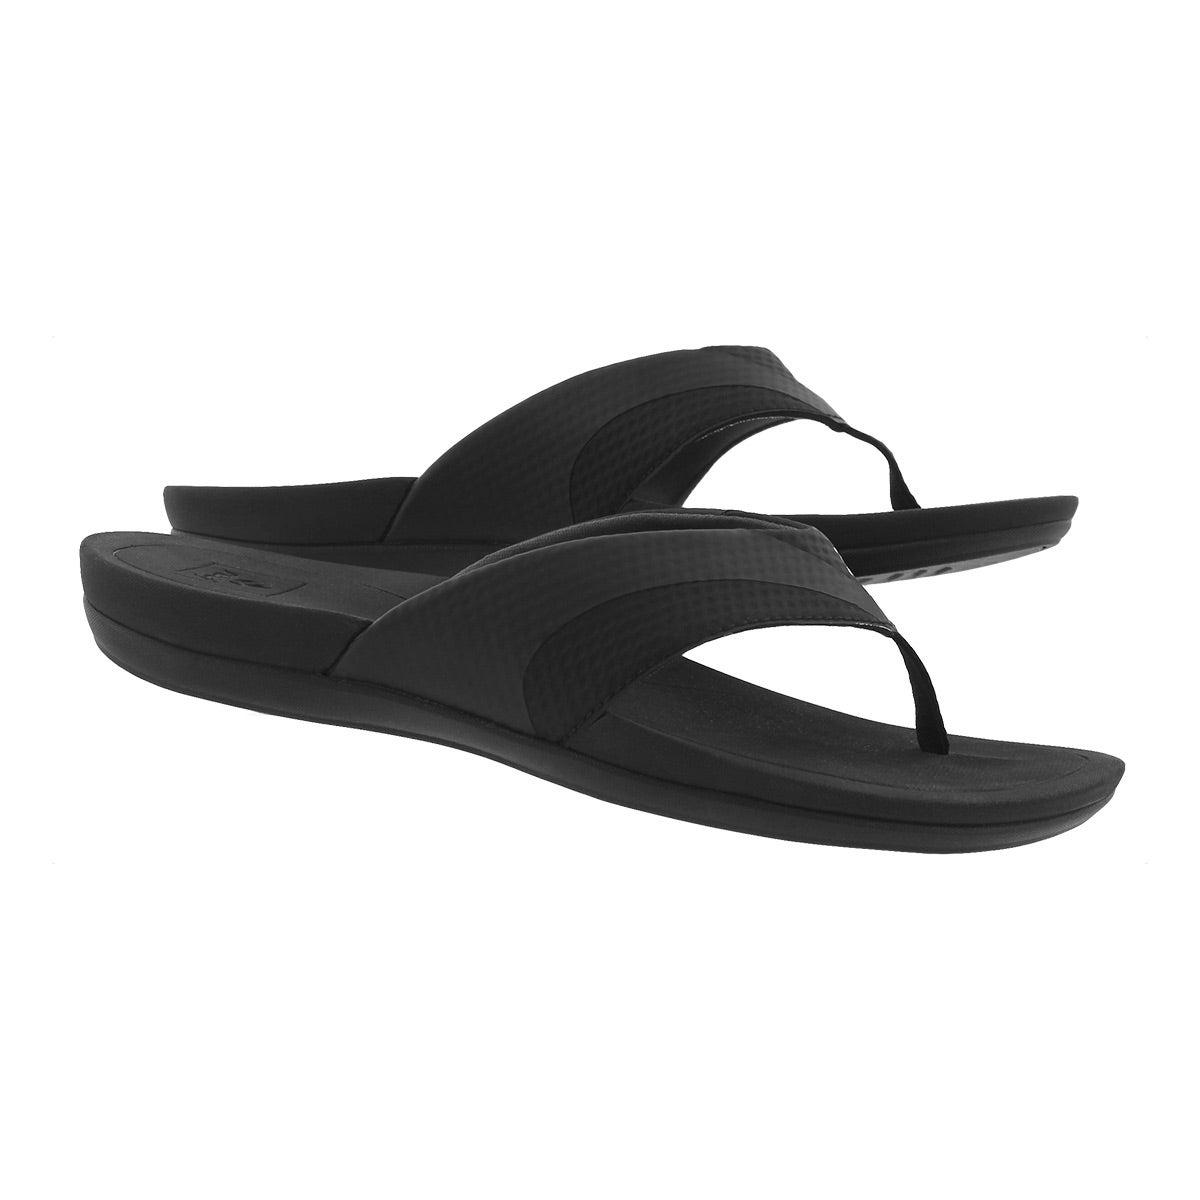 Lds Energy II black thong sandal